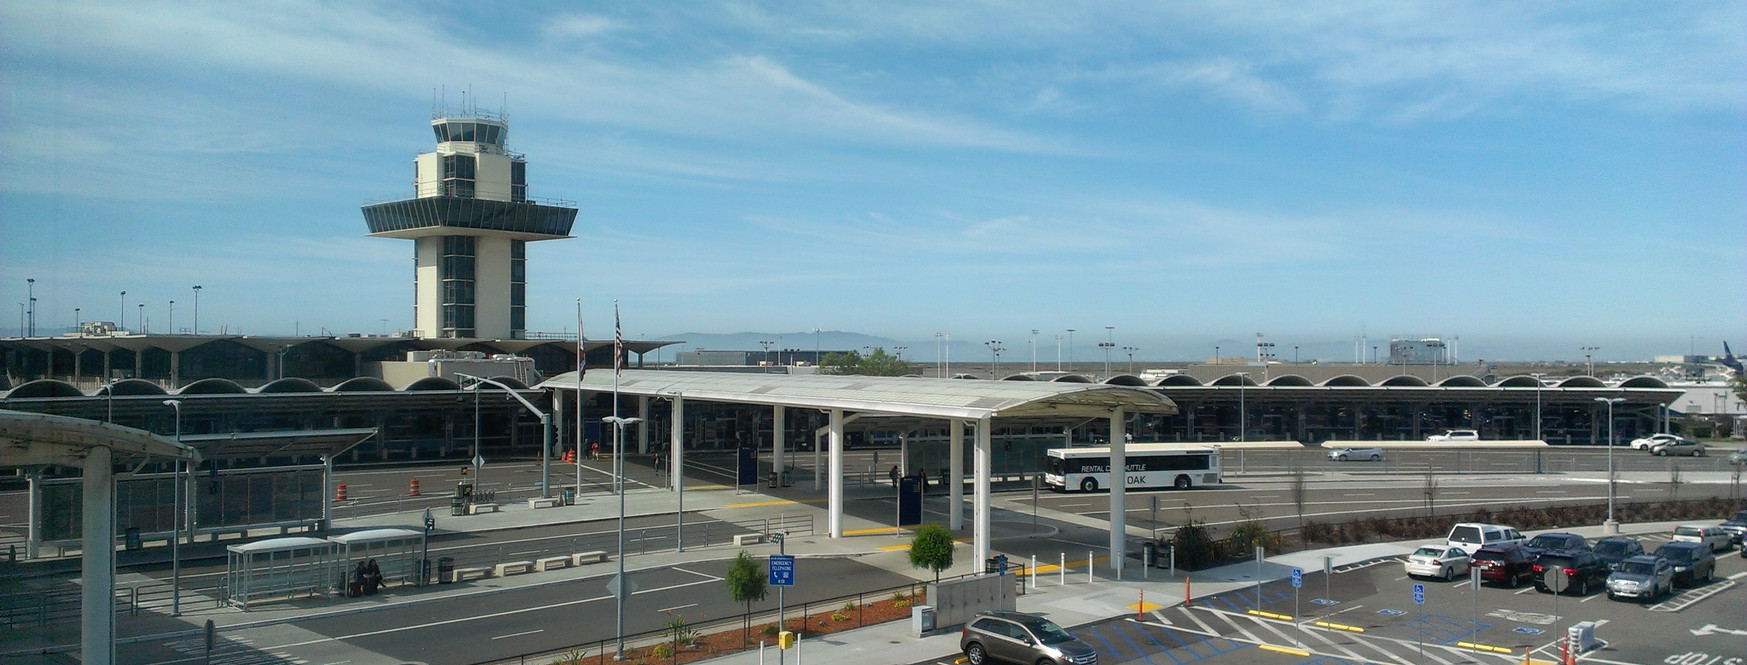 OAK-Airport.jpg